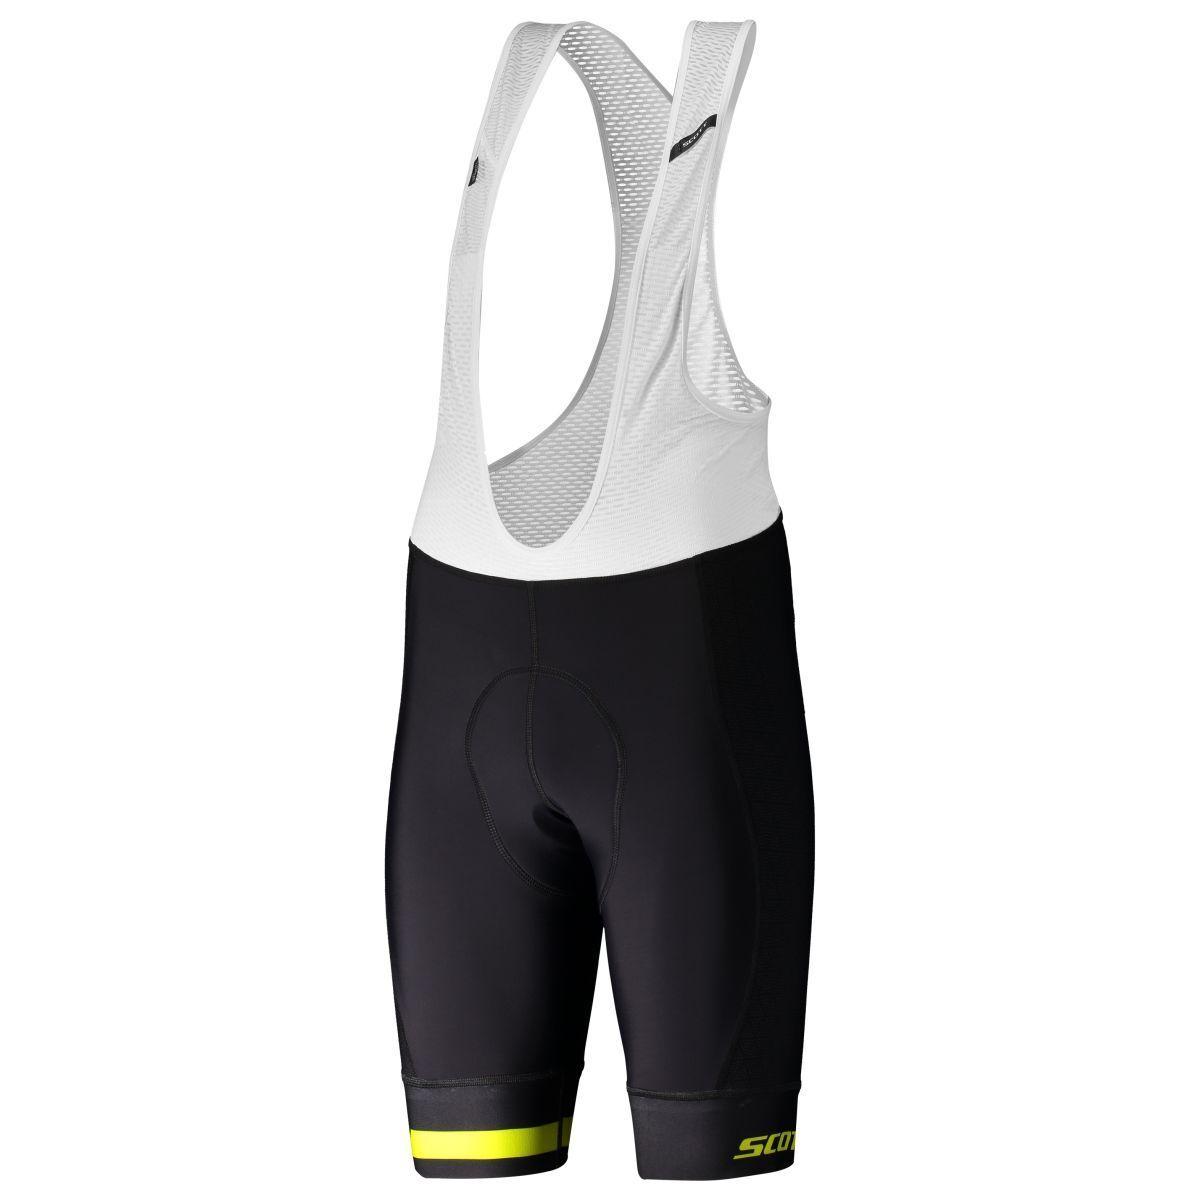 Scott RC Premium ITD ++++ Fahrrad Trägerhose kurz black yellow 2019